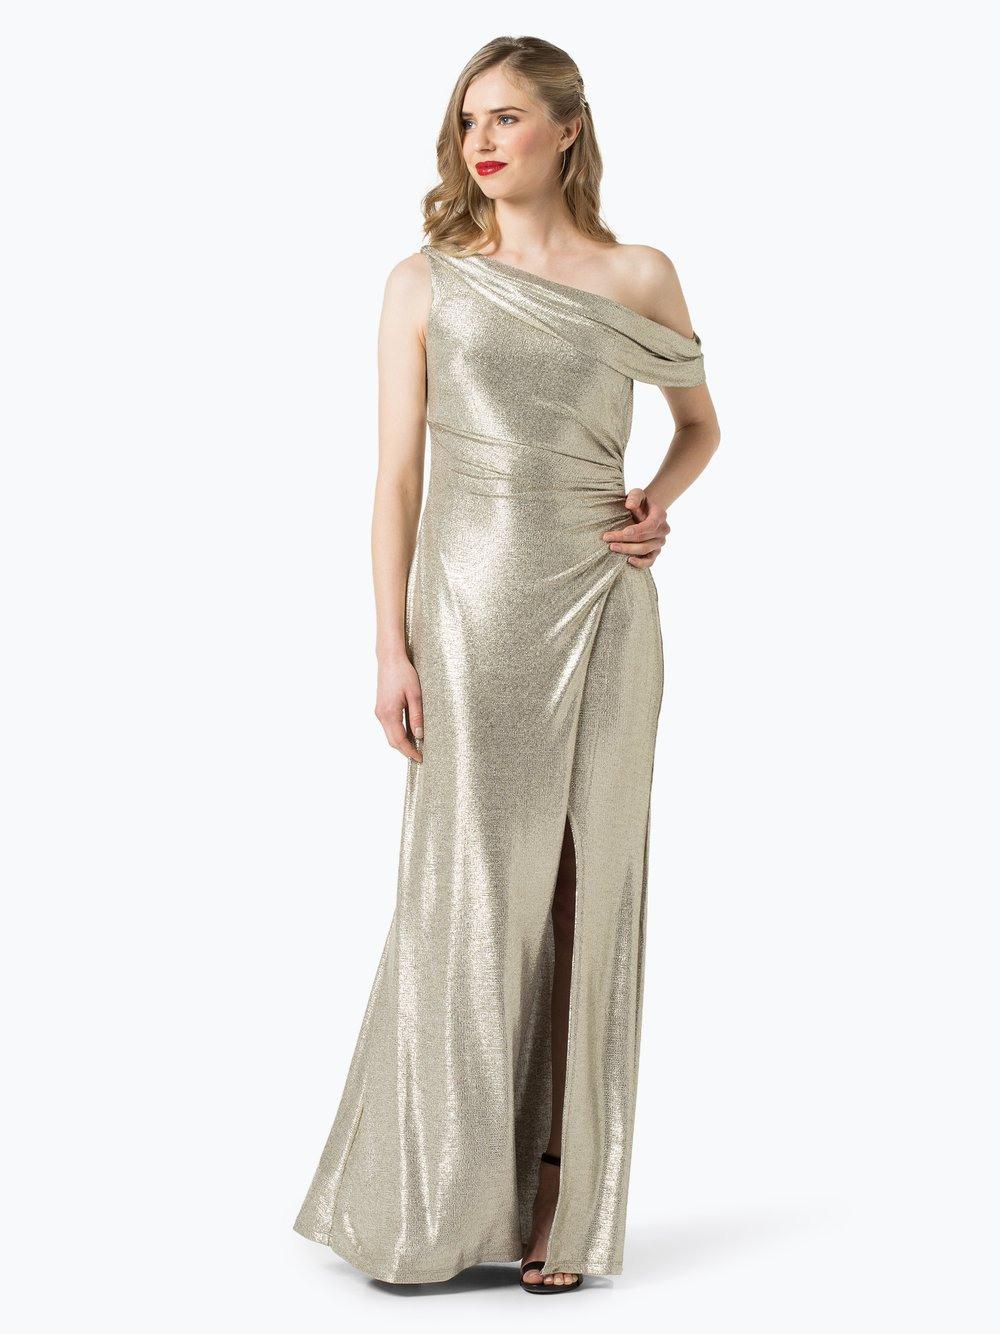 17 Cool Ralph Lauren Abend Kleid Design17 Großartig Ralph Lauren Abend Kleid Design